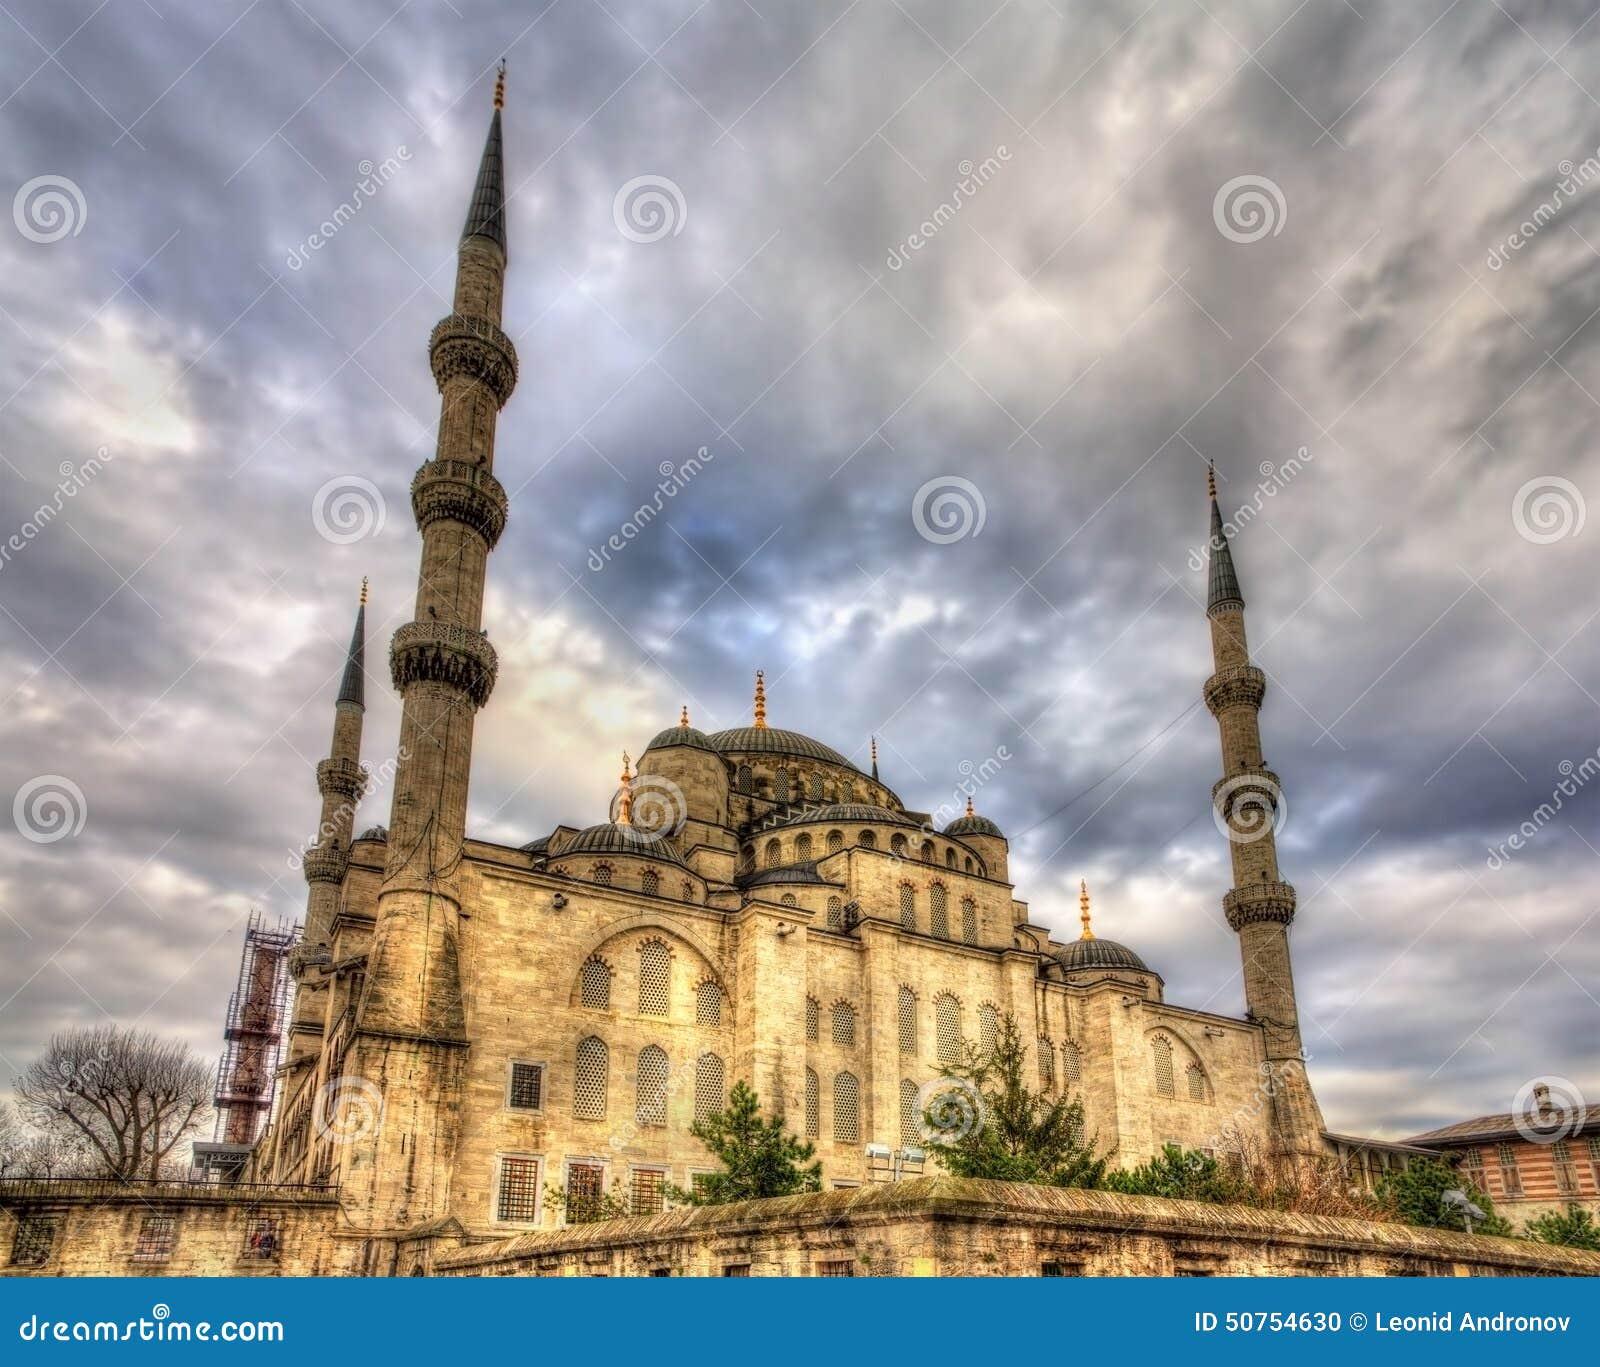 Sultan Ahmet Mosque (Blue Mosque) in Istanbul